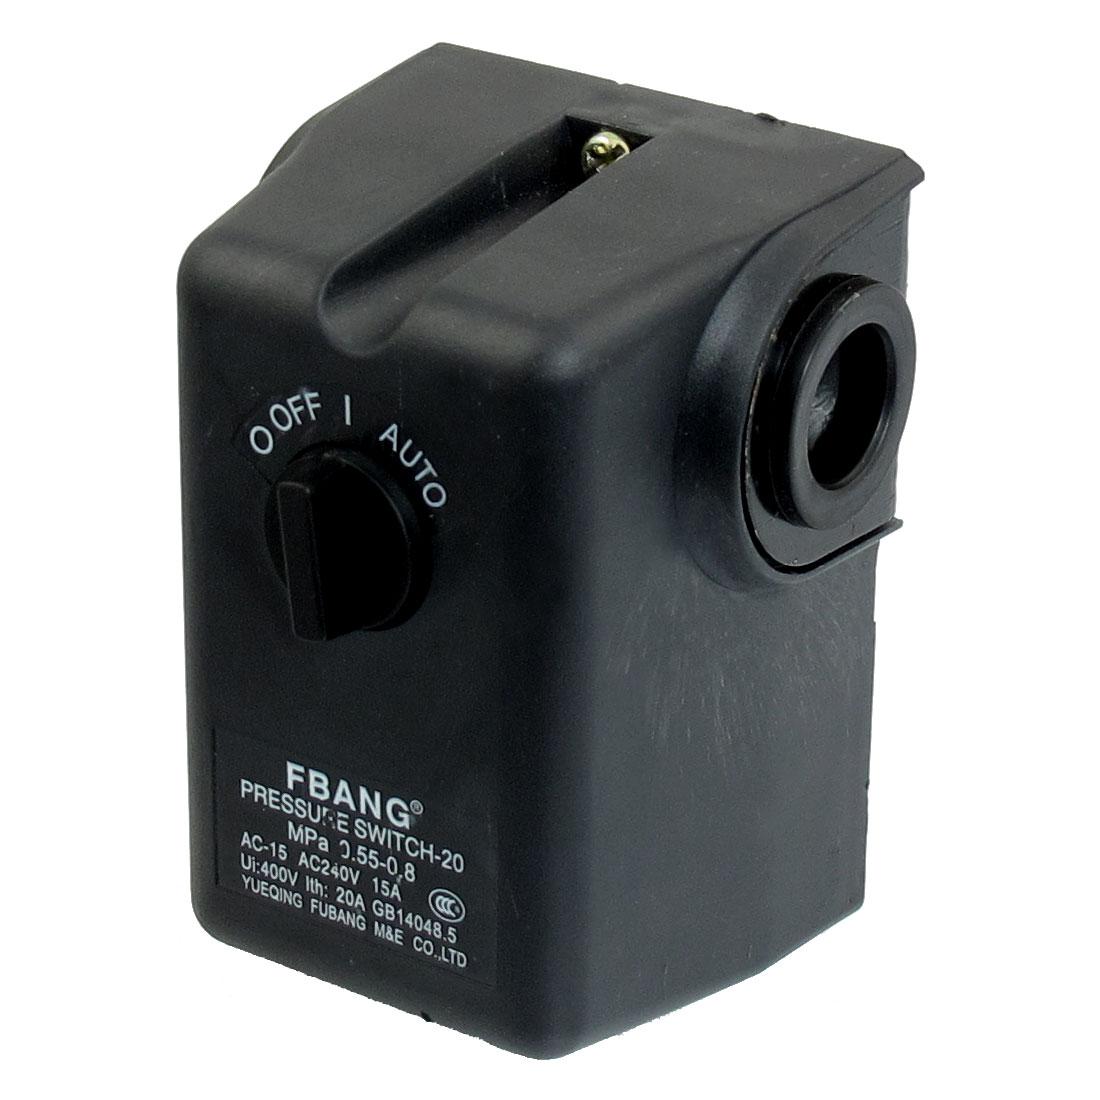 AC 240V 15A 80-115PSI 1 Port 2-Position Air Compressor Pressure Switch Control Valve